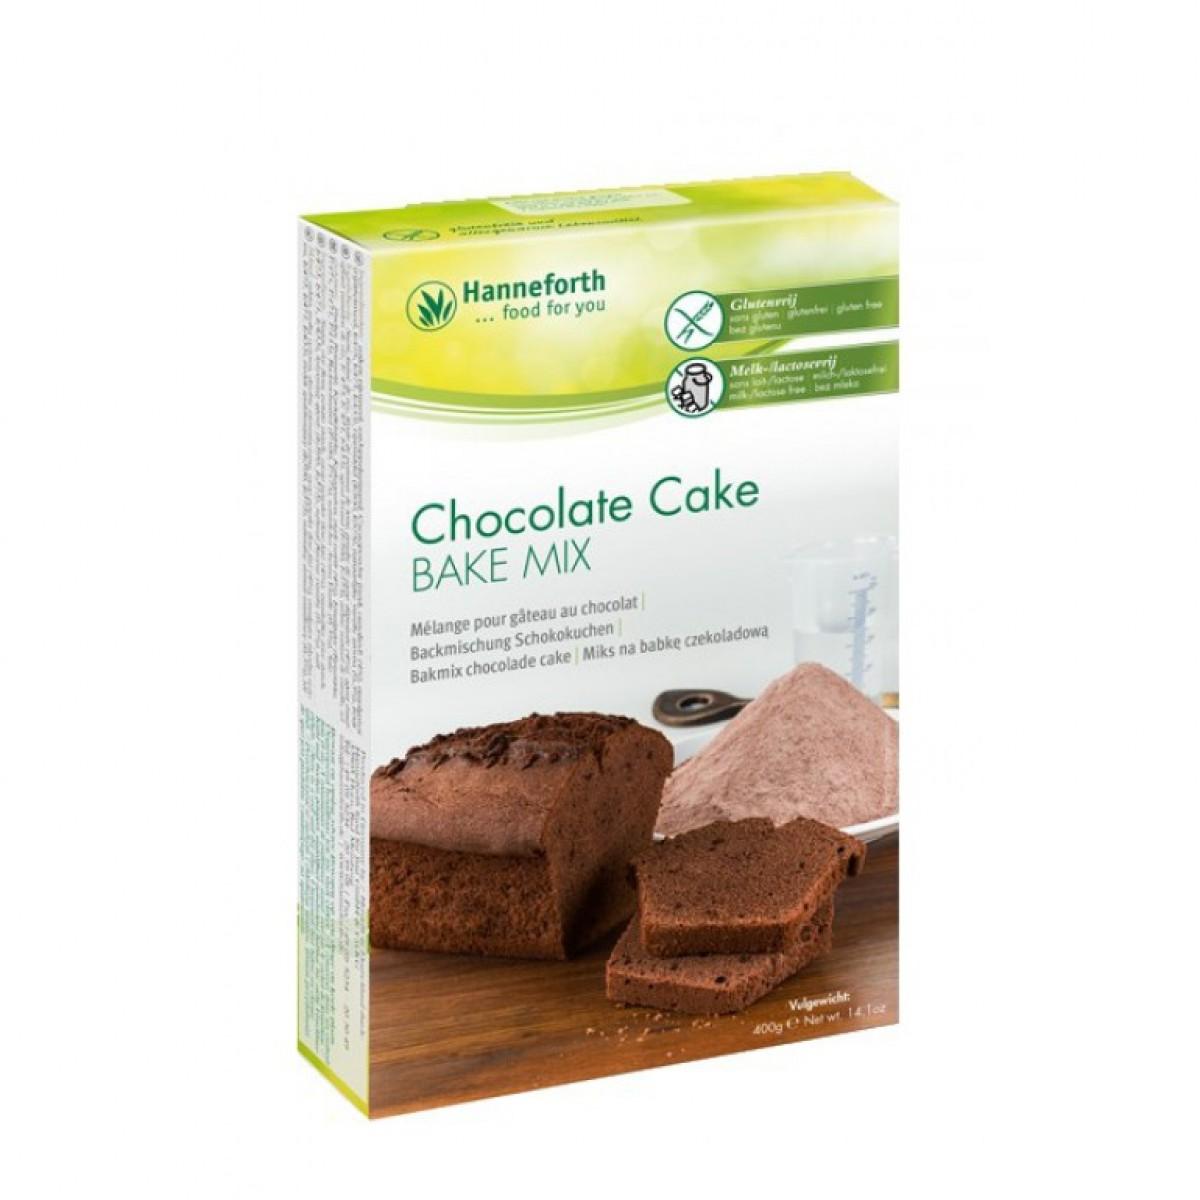 Chocolade Cake Bakmix